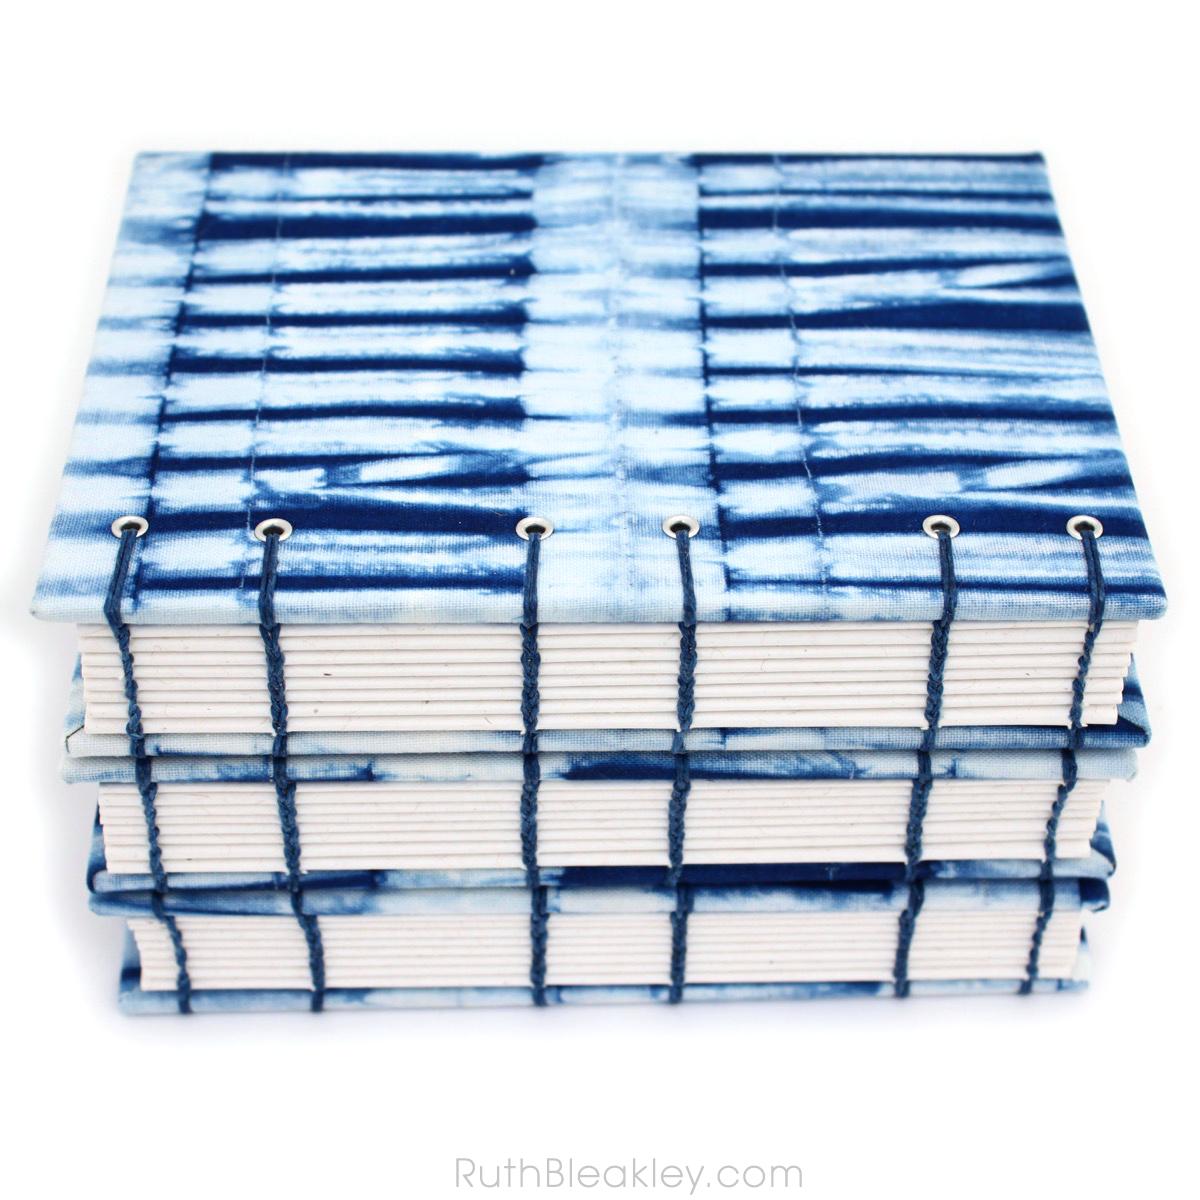 Indigo Shibori Journal handmade by book artist Ruth Bleakley with fabric from Cape Cod Shibori - 14